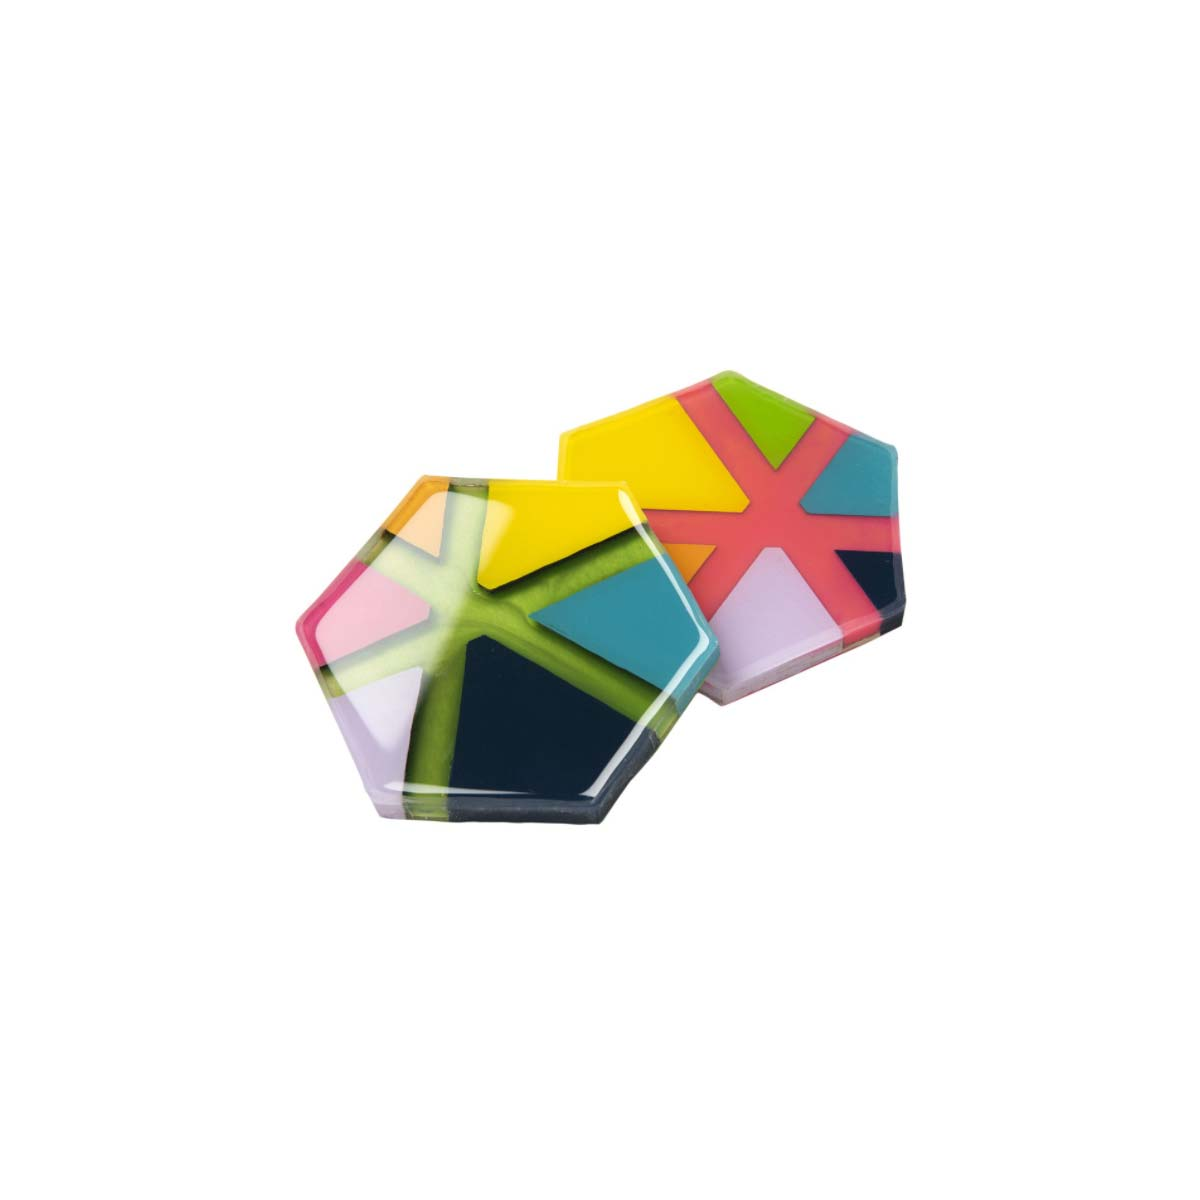 Mod Podge ® Resin Pouring Surface - Hexagon Star Coasters - 56935E